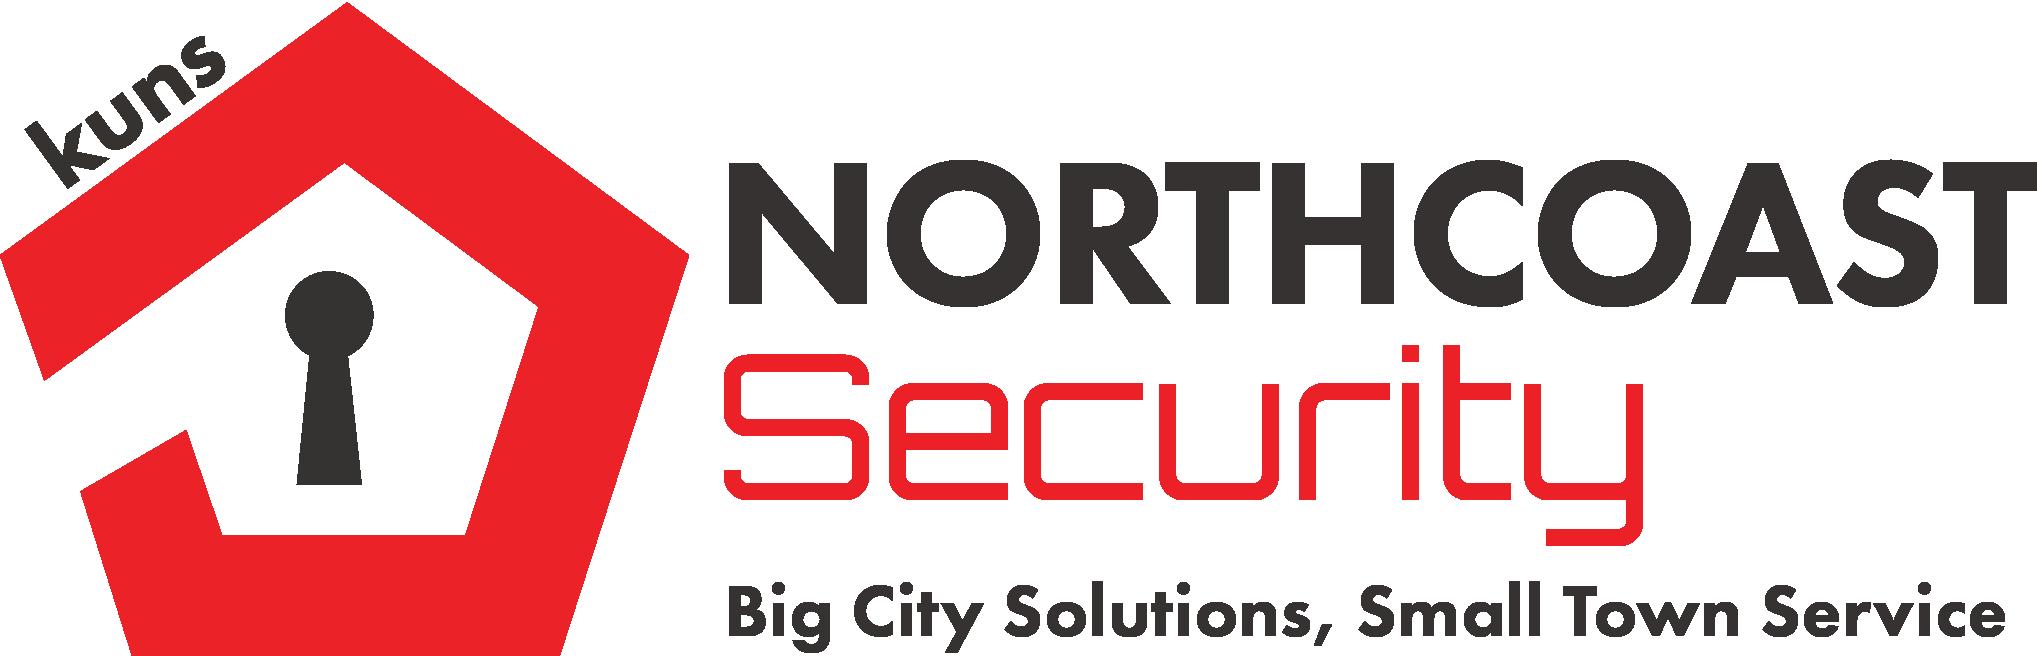 Northcoast Security